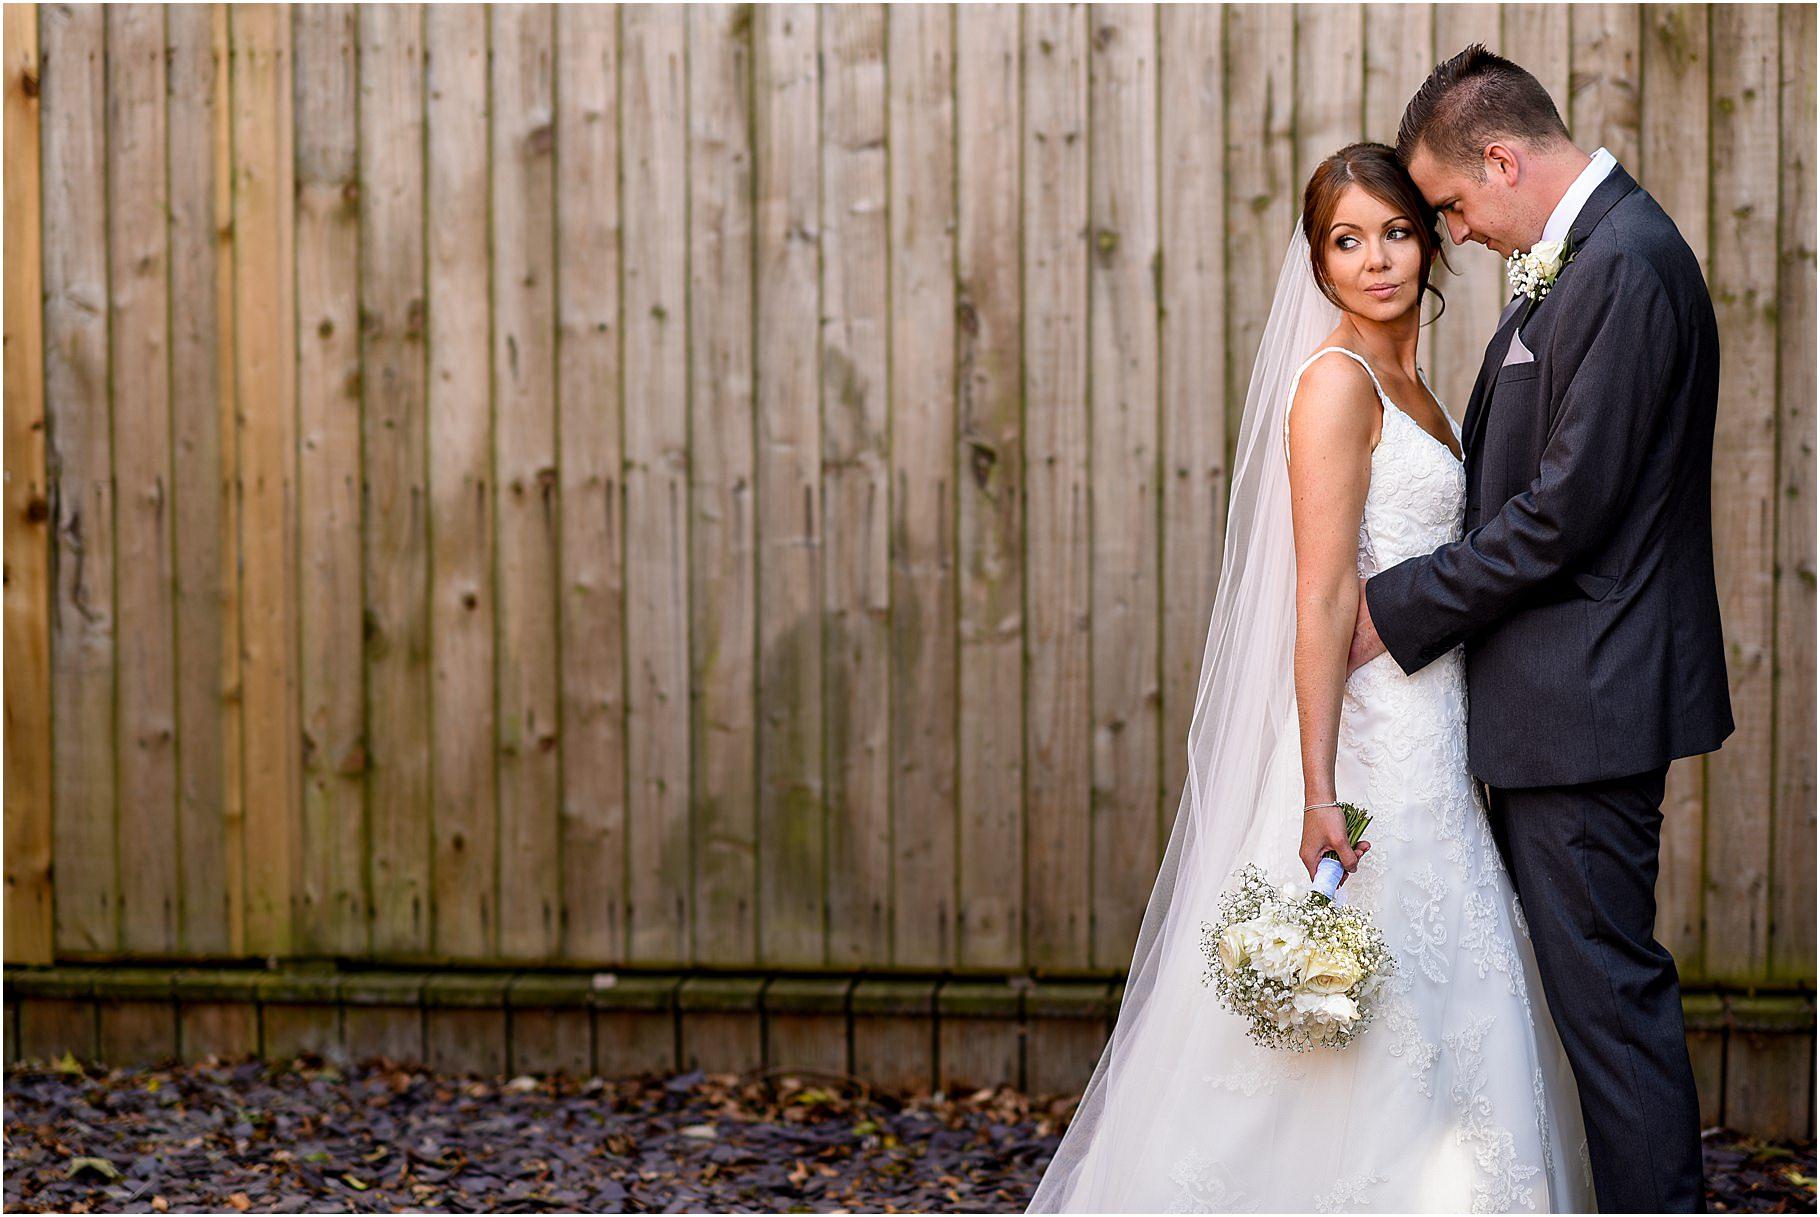 the-villa-wrea-green-wedding-photographer-52.jpg